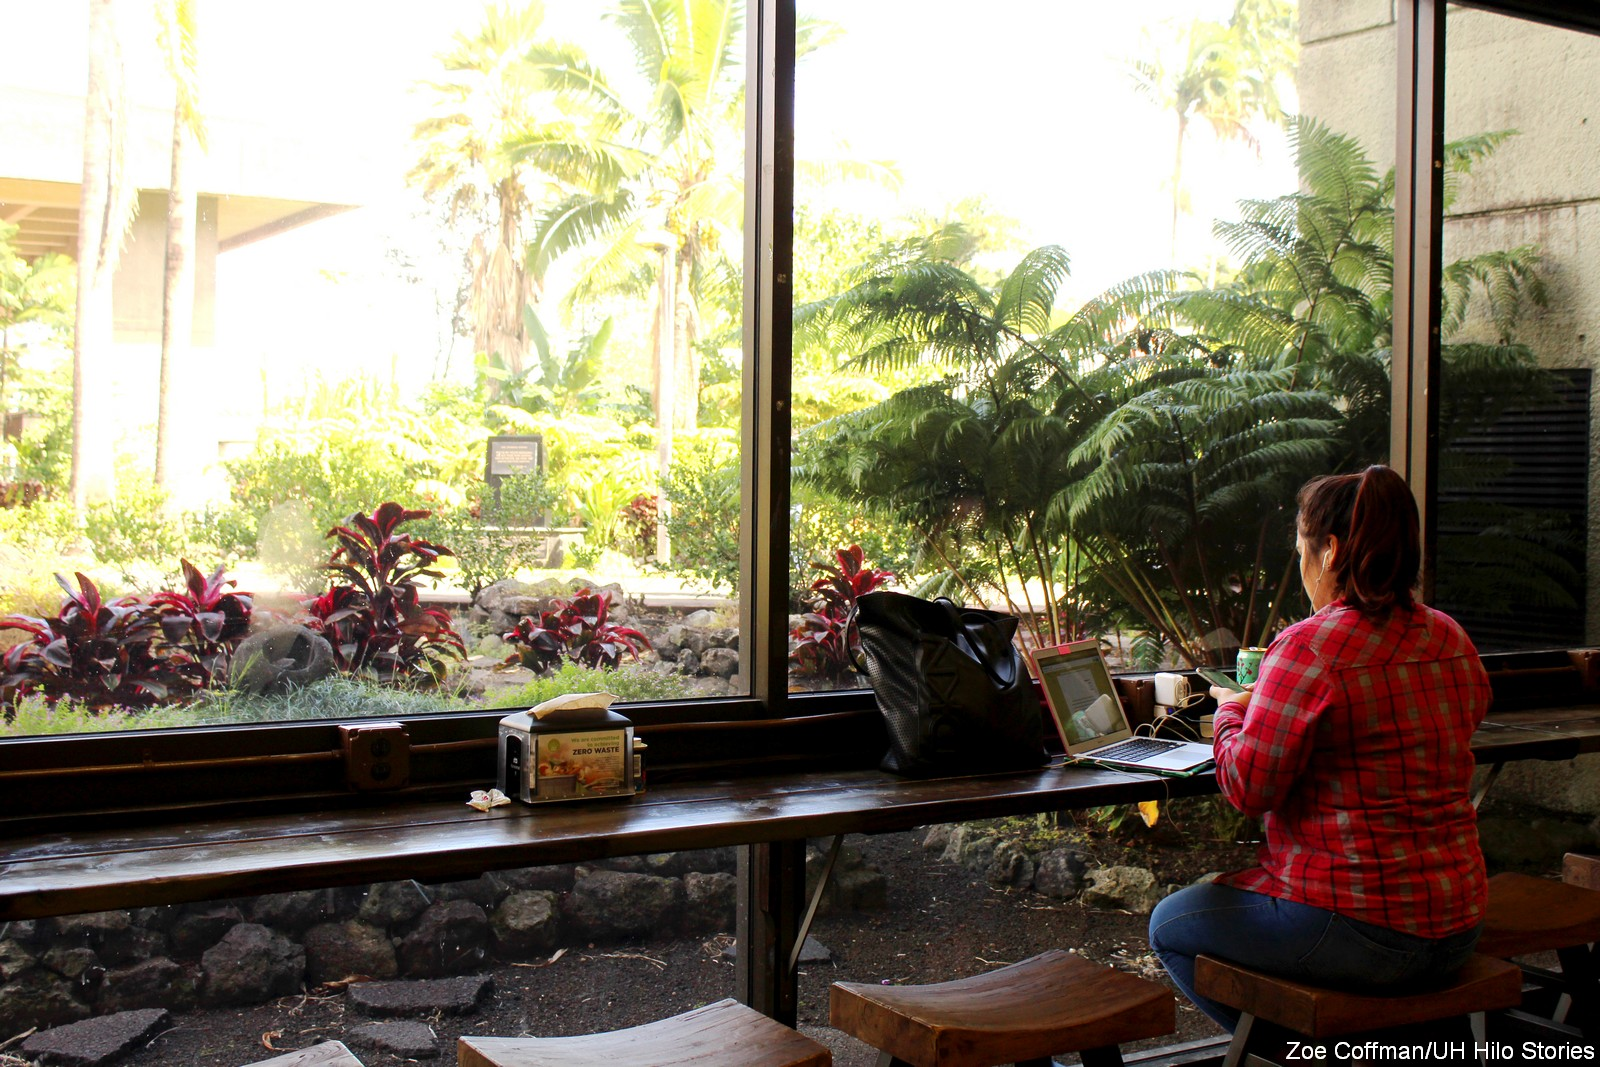 PHOTOS: UH Hilo students enjoying Dining Room transformation